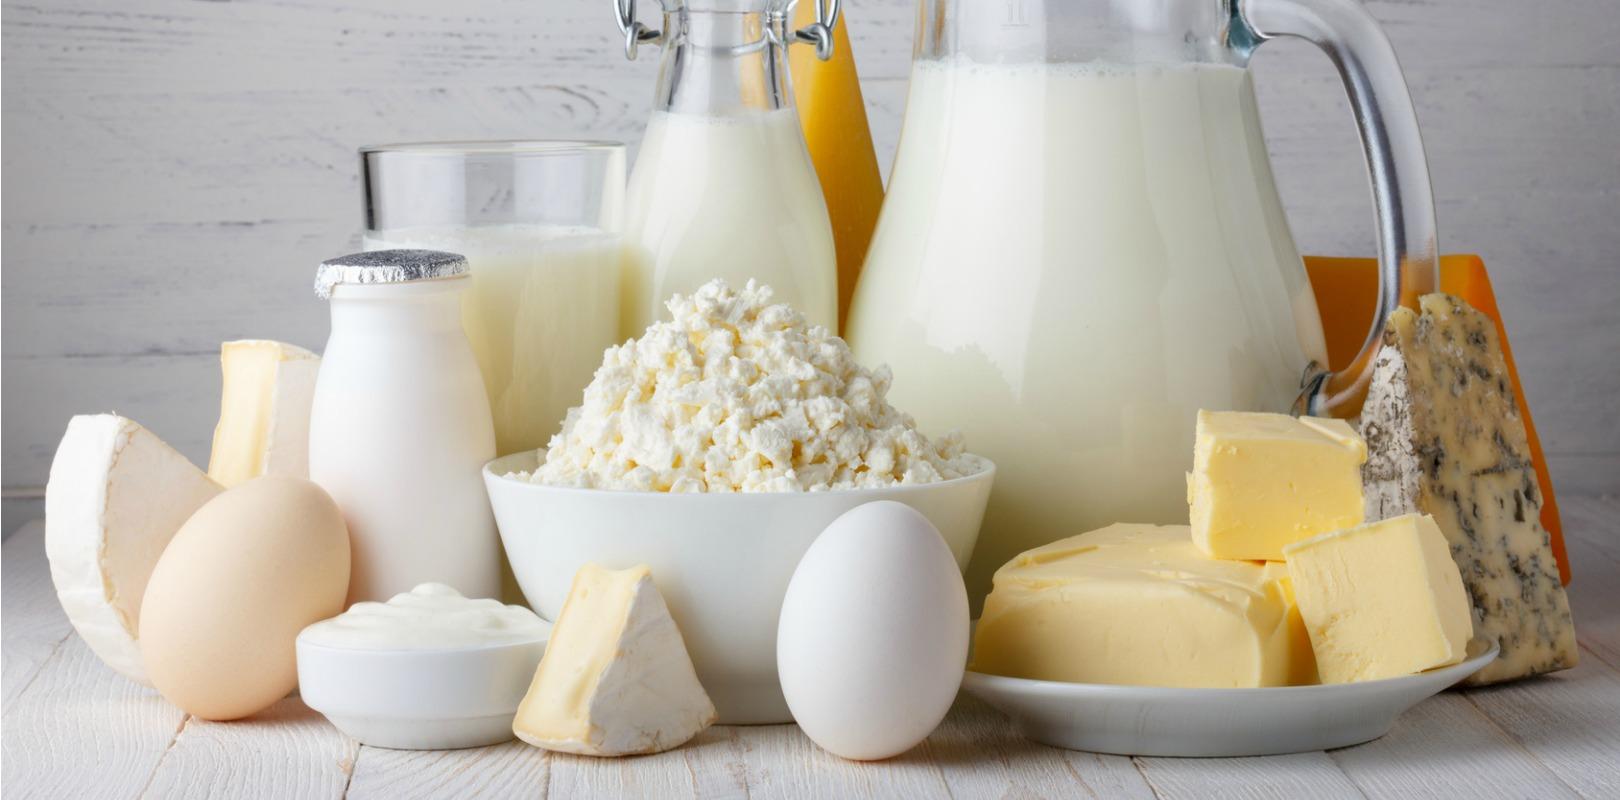 Milk and yogurt may increase vitamin B12 intake - Yogurt in Nutrition